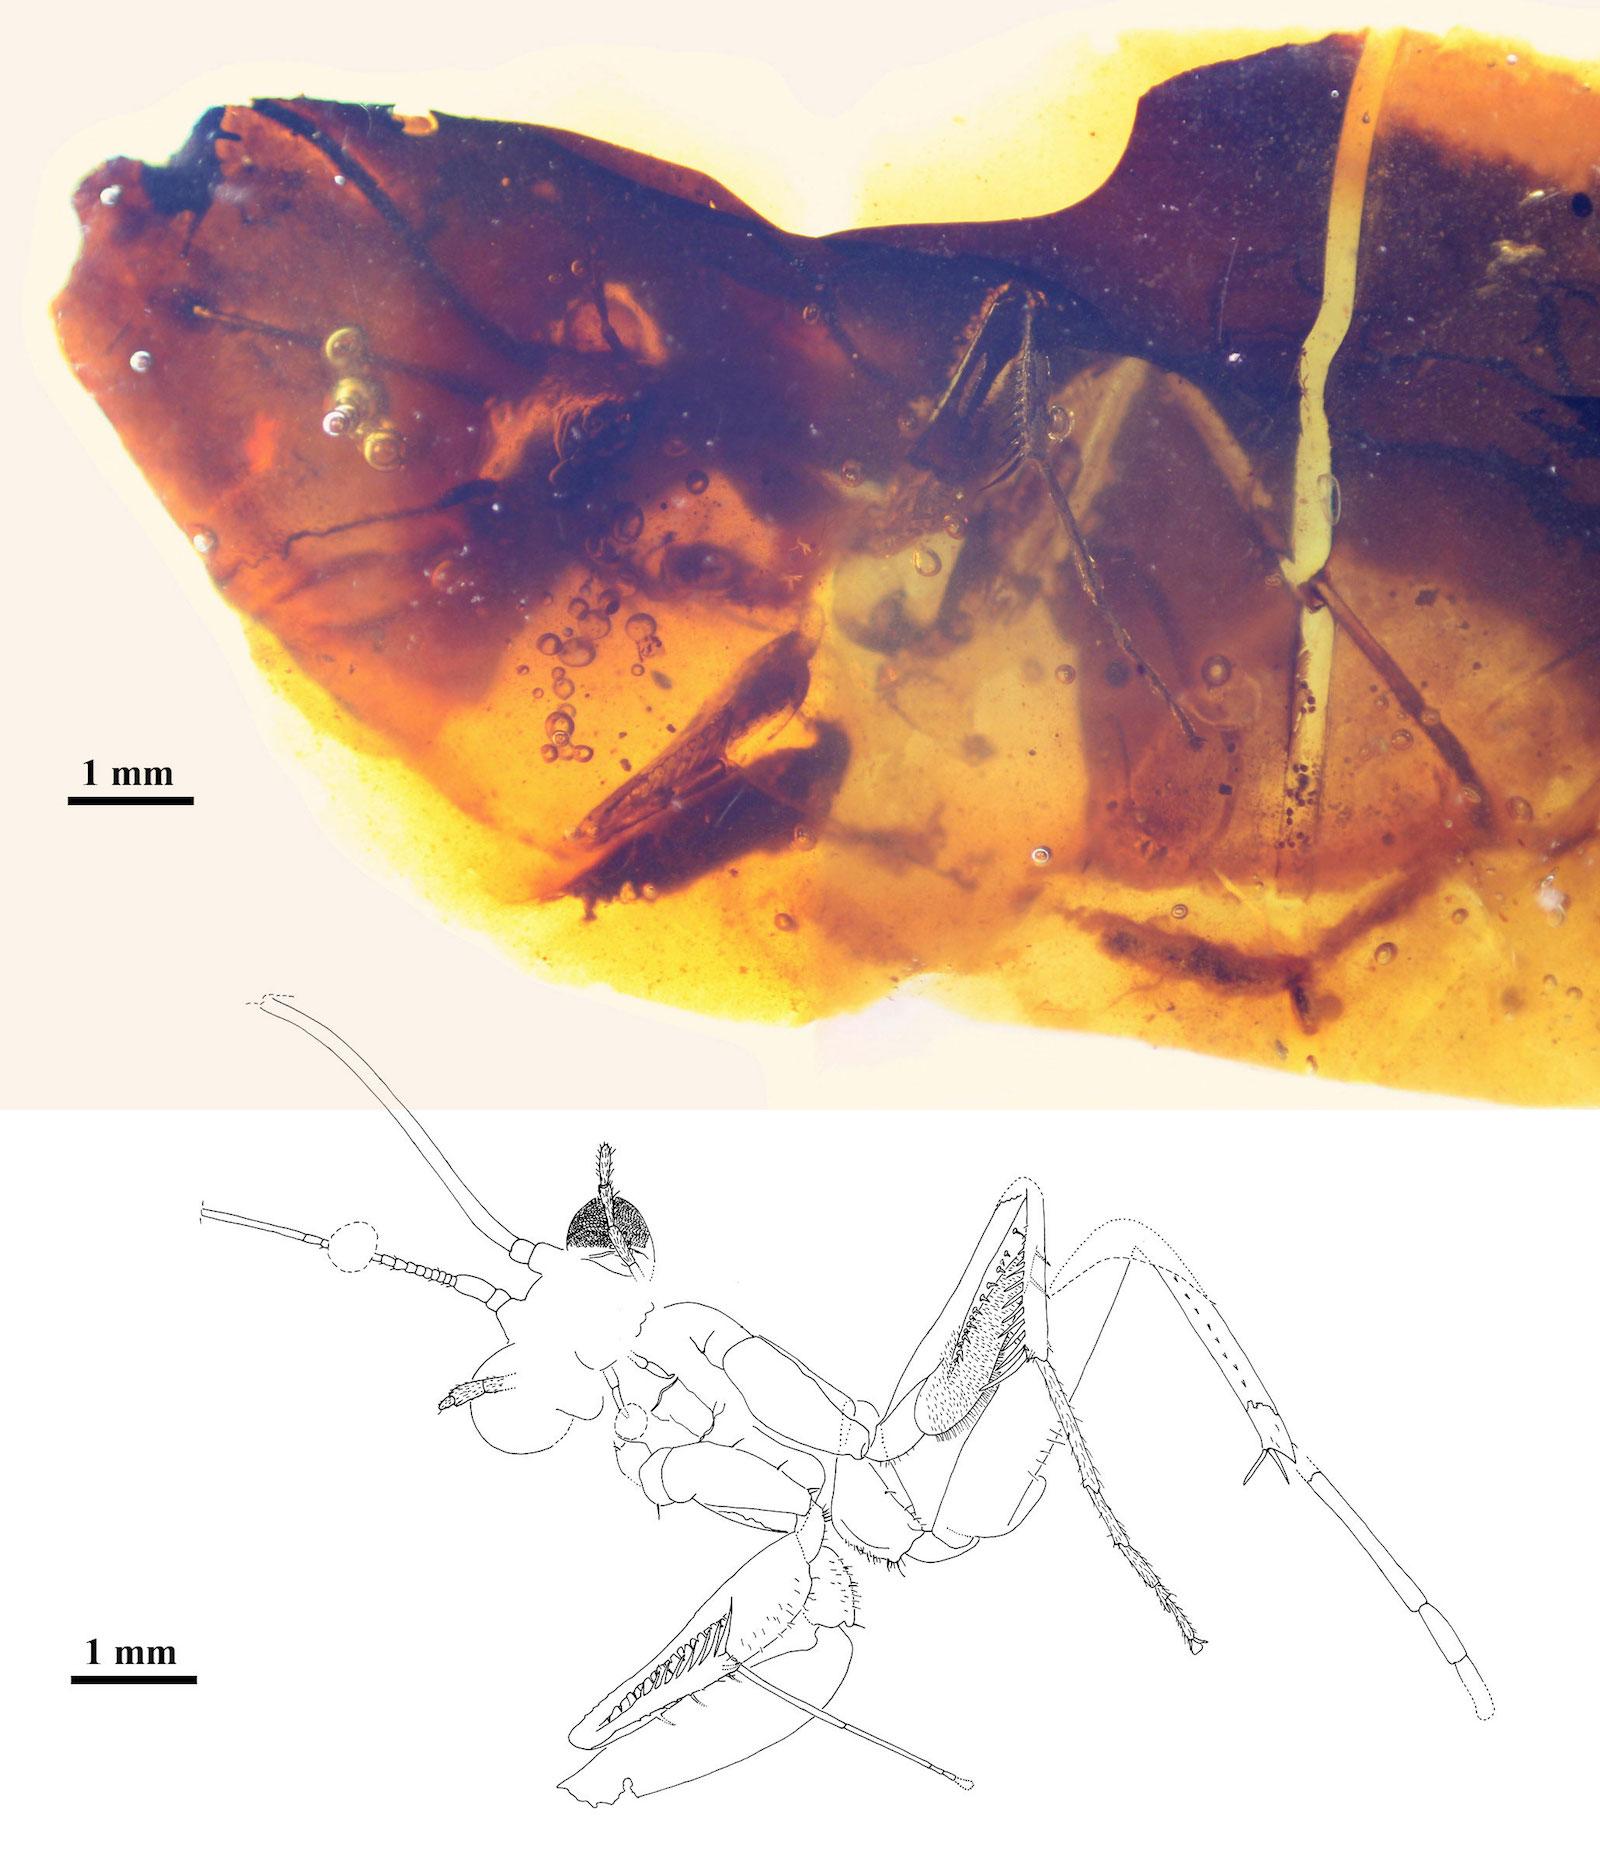 Primera mantis religiosa fósil hallada en España